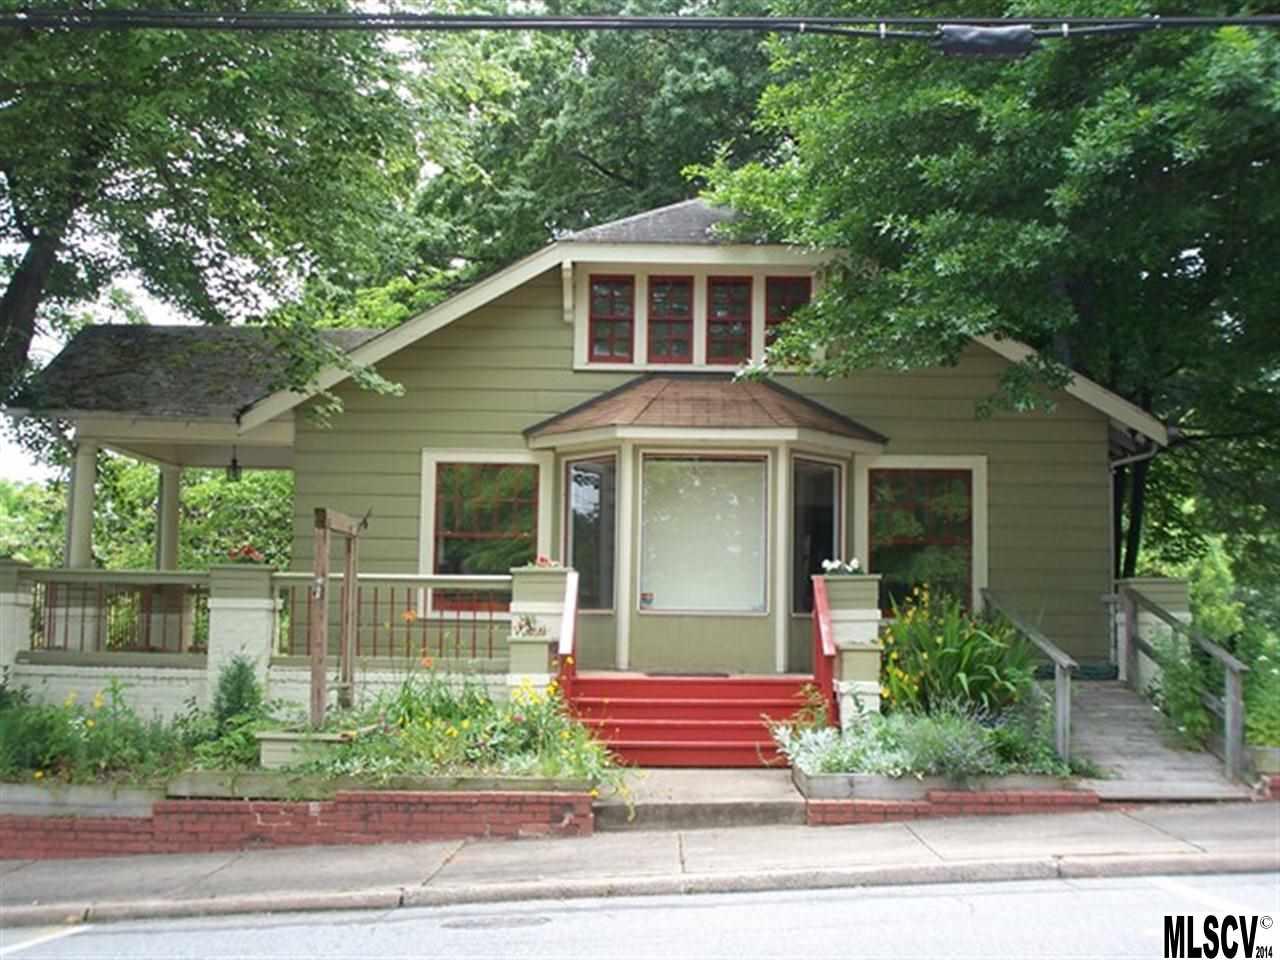 Real Estate for Sale, ListingId: 27145734, Lenoir,NC28645